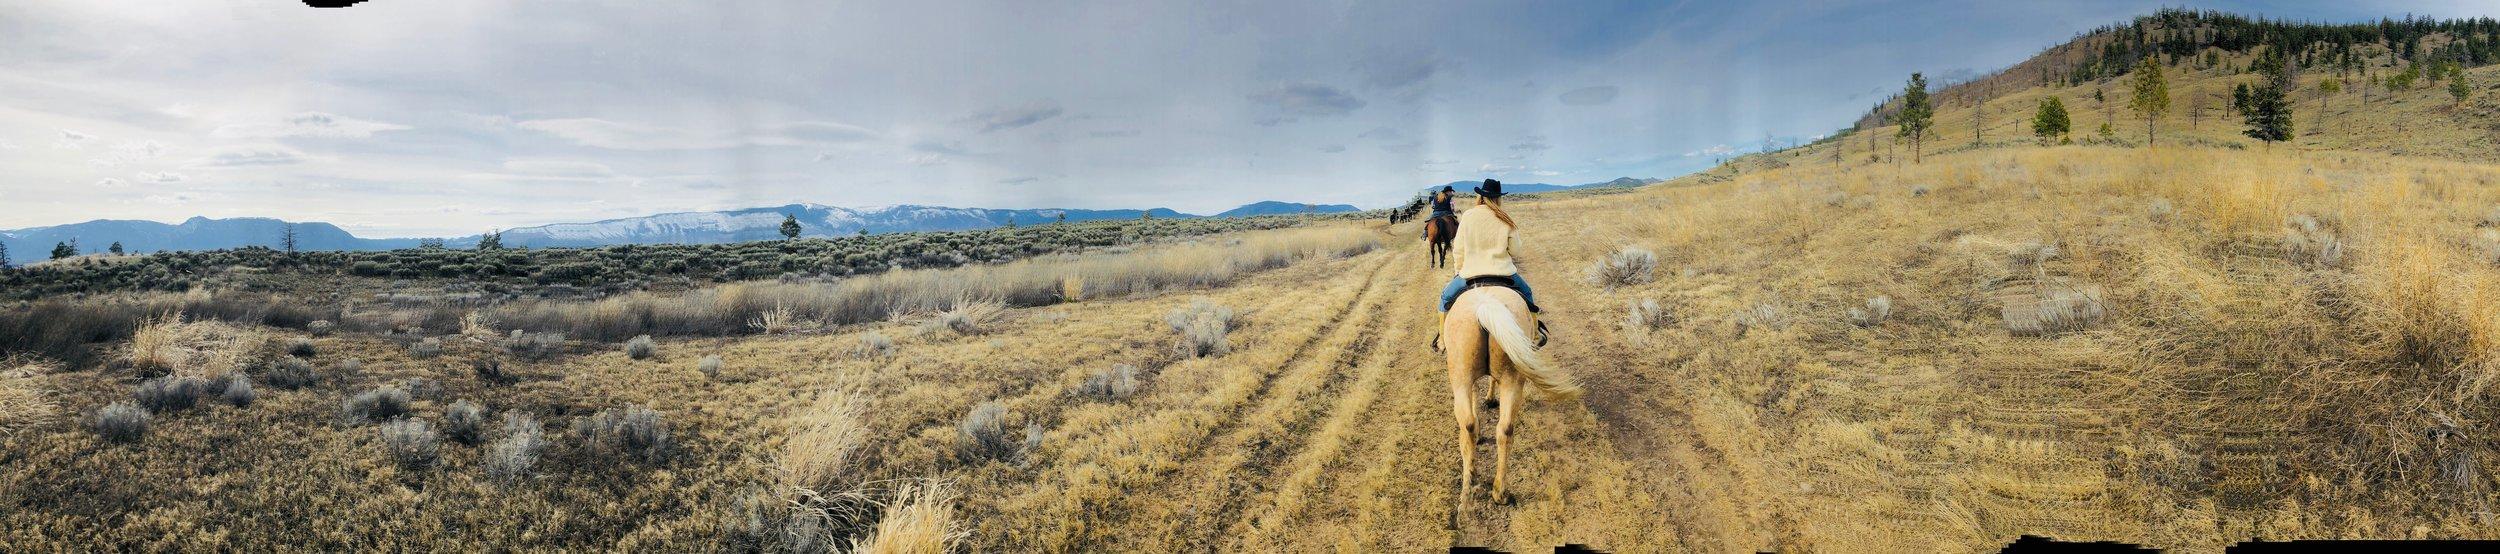 Soulful Entrepreneur Retreat horseback riding.jpg